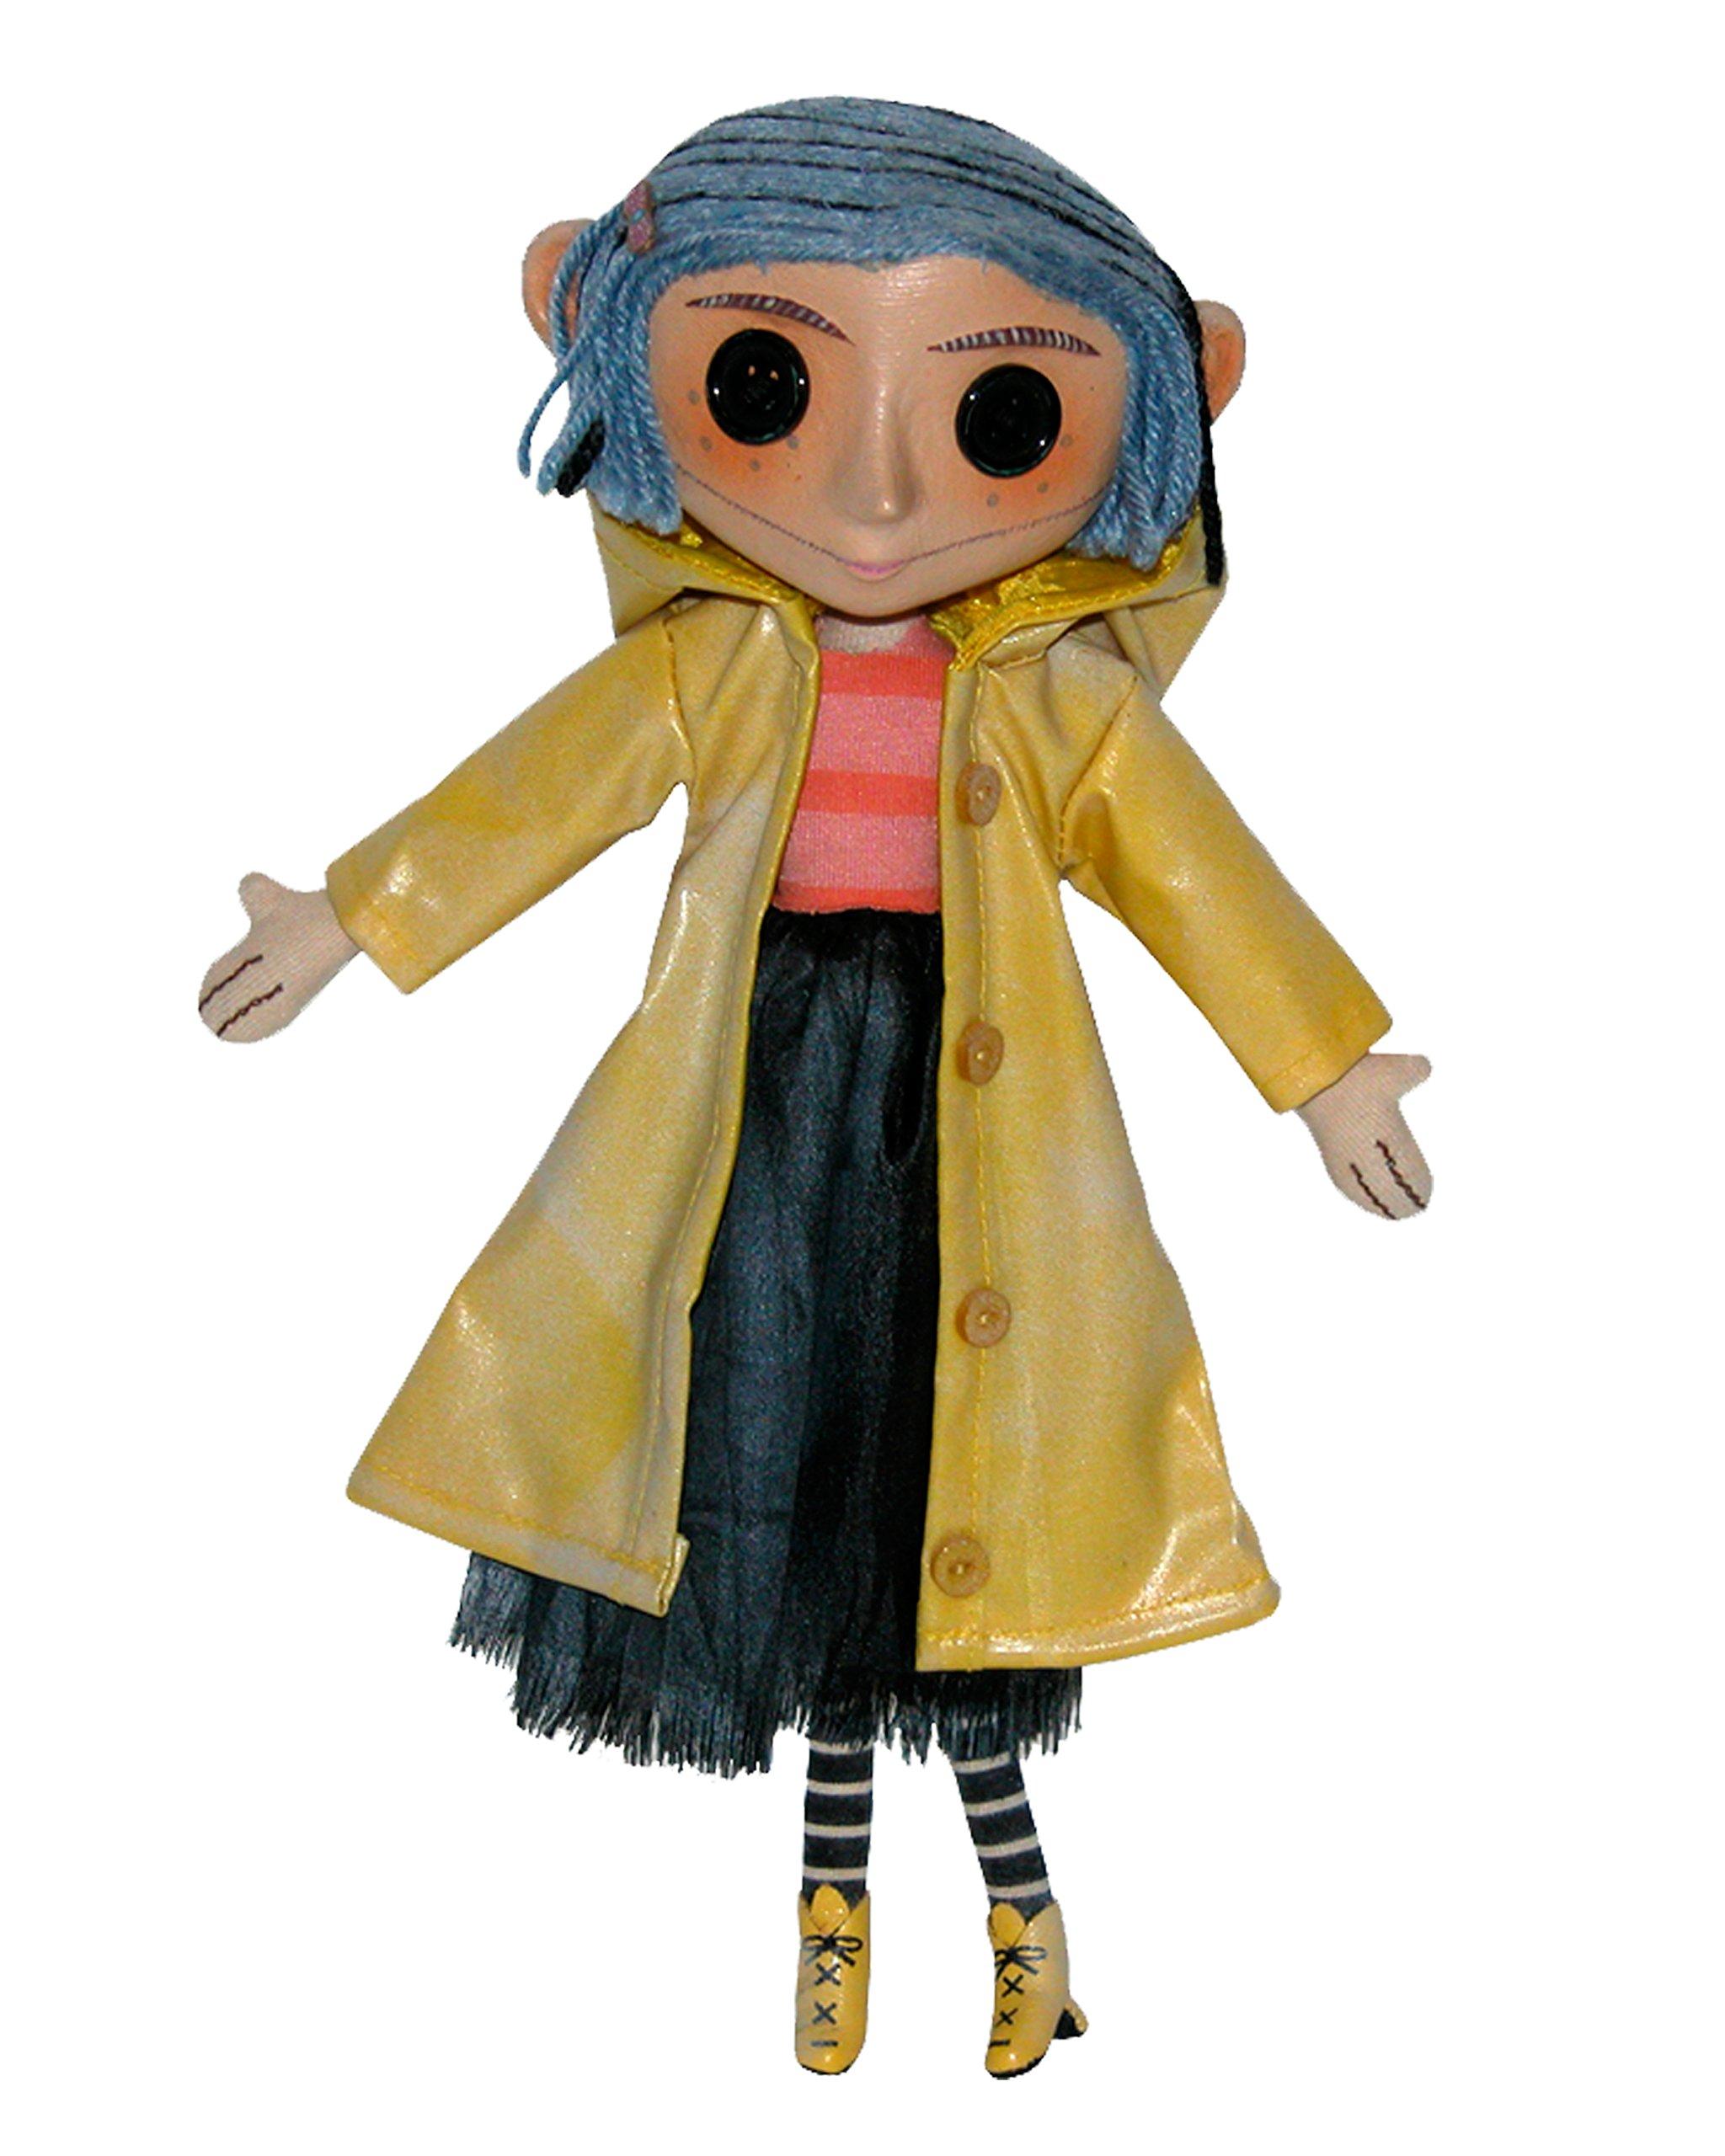 NECA - Coraline - Prop Replica 10'' Coraline Doll by NECA